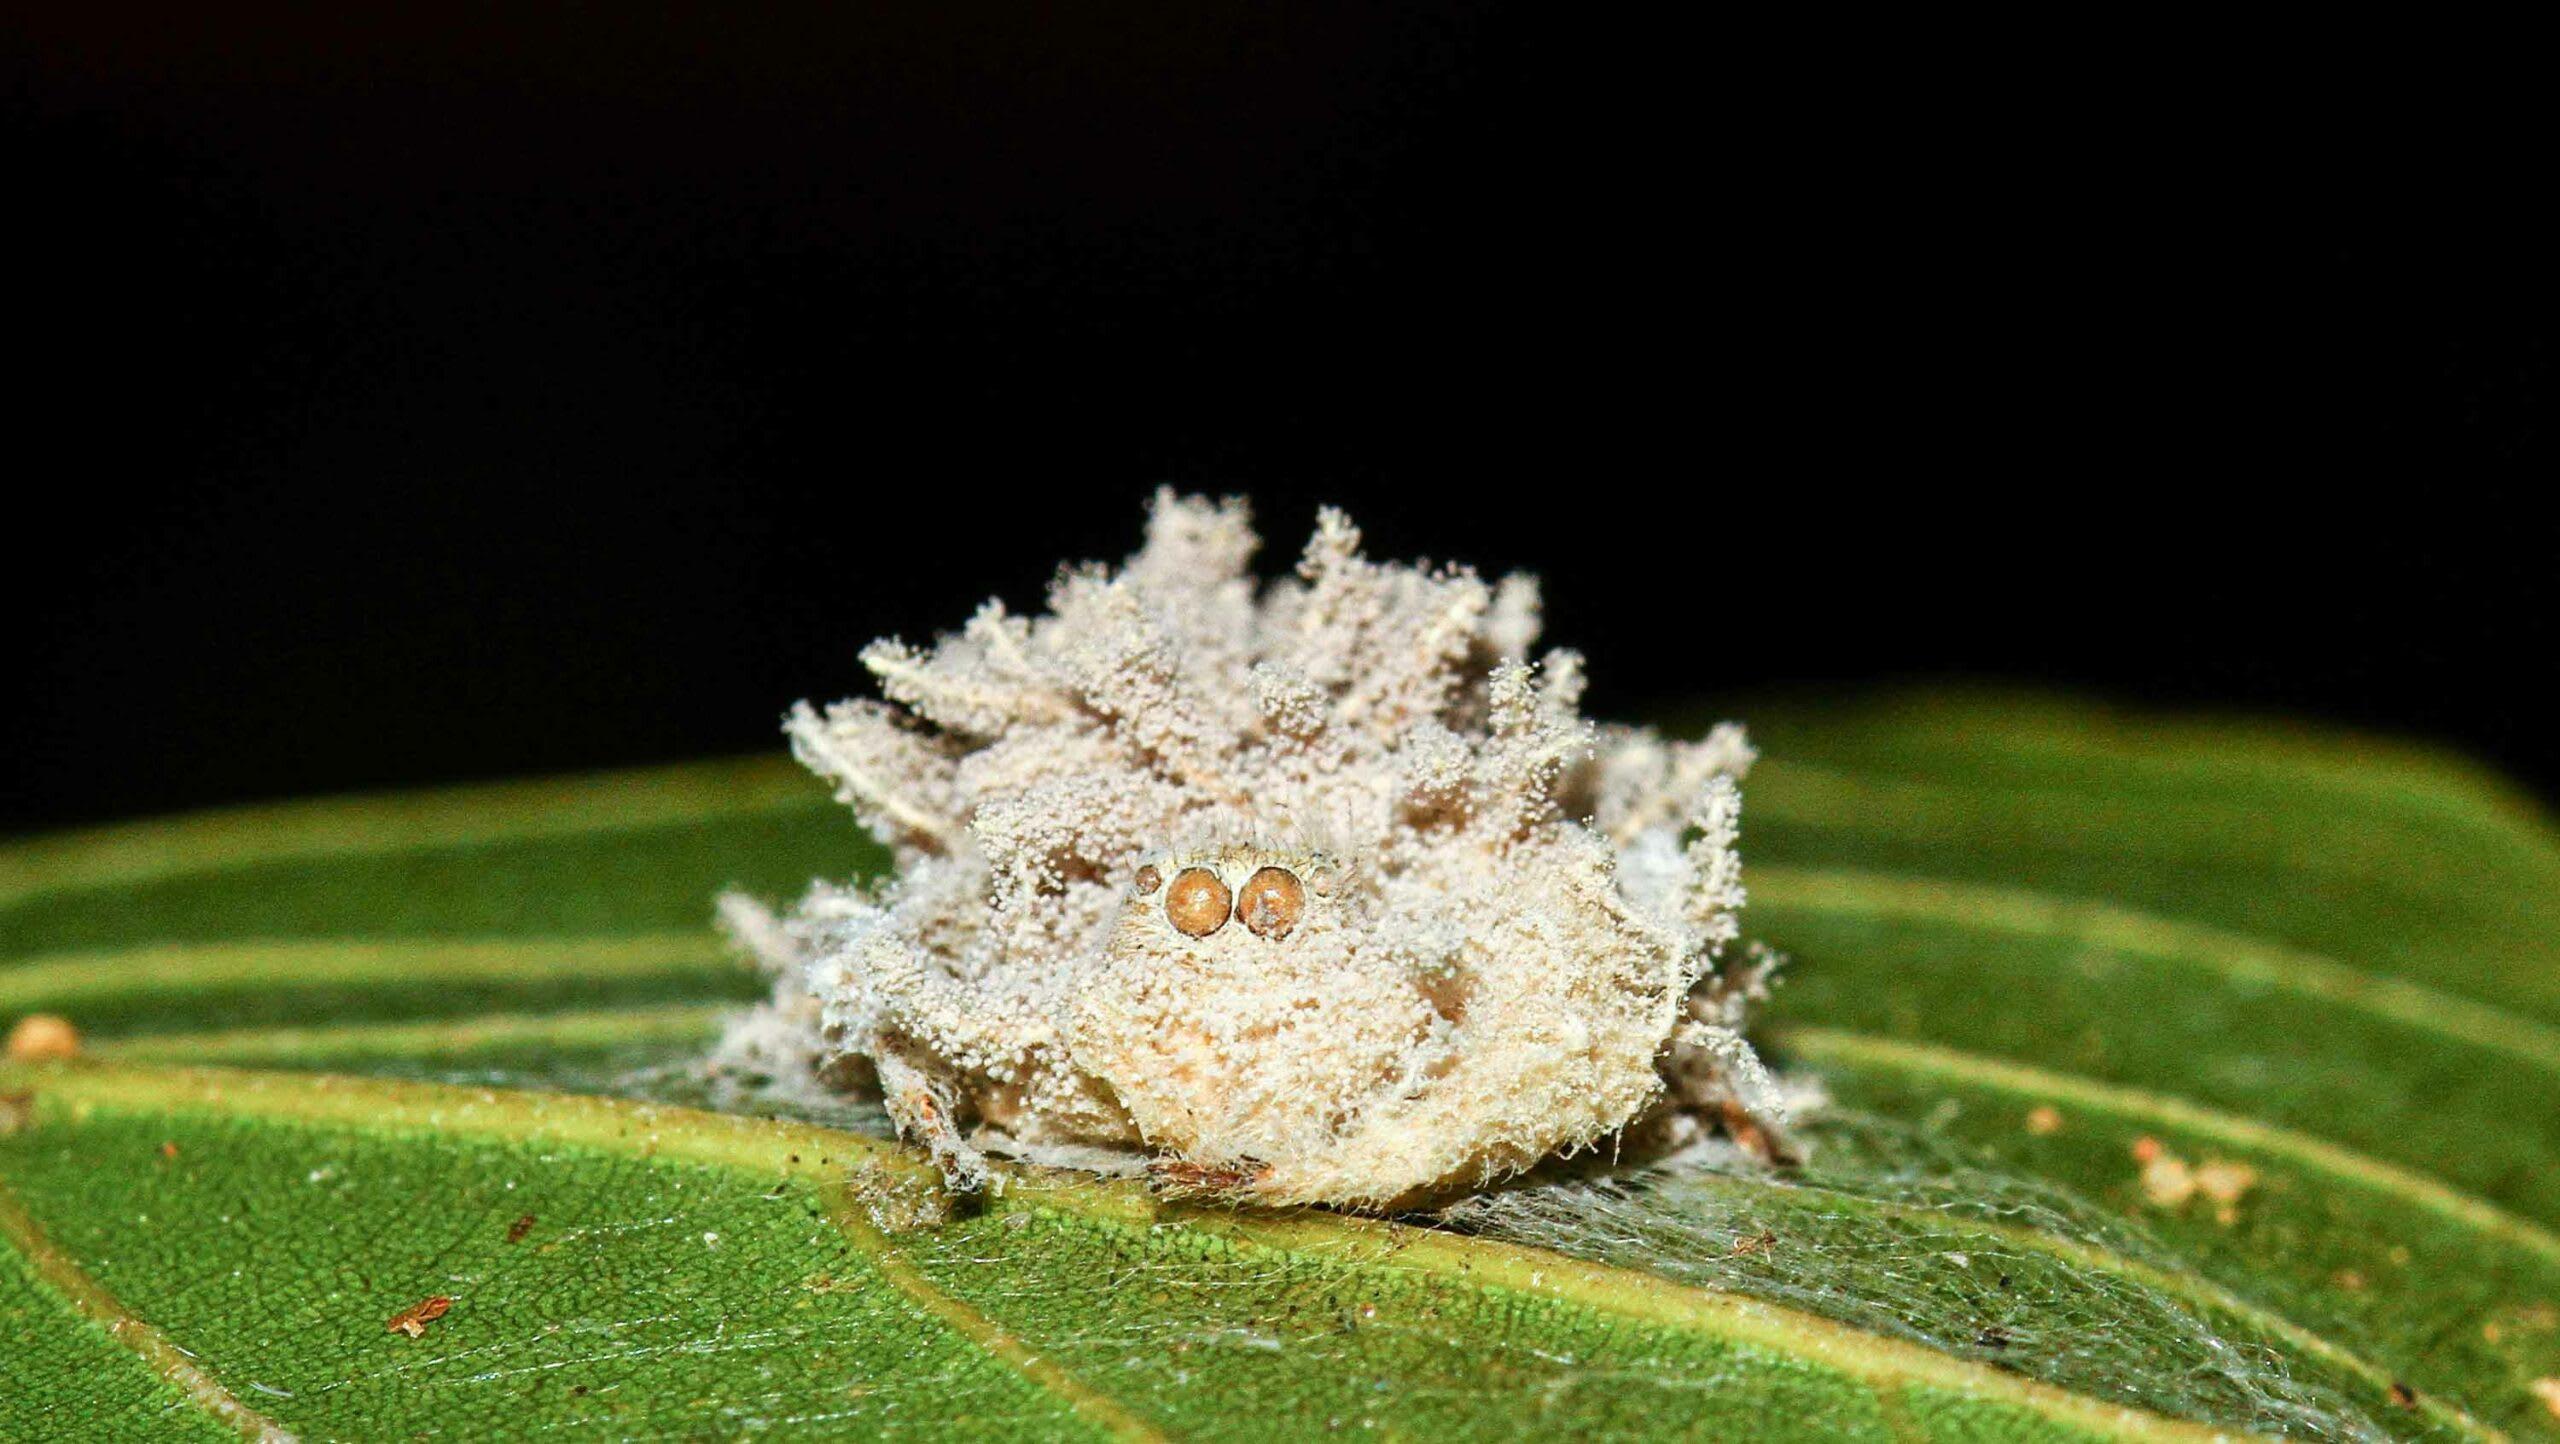 jumping-spider-mummified-cordyceps-fungus